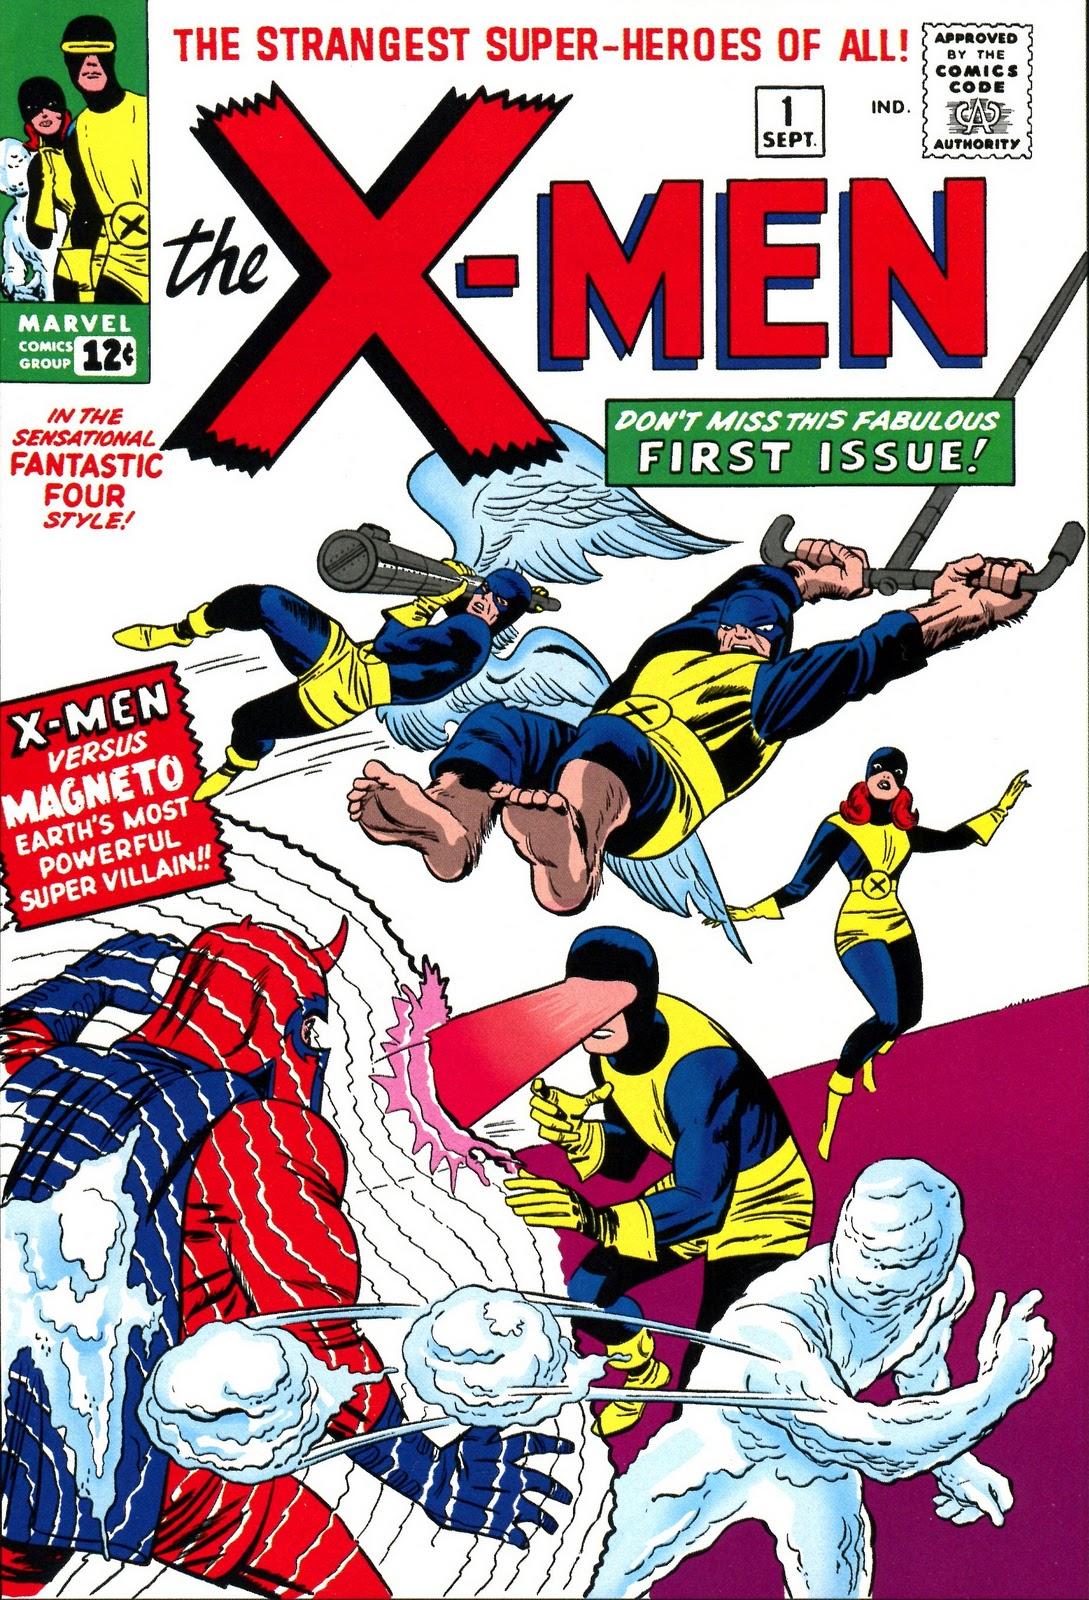 X-Men+Vol+1030.jpg